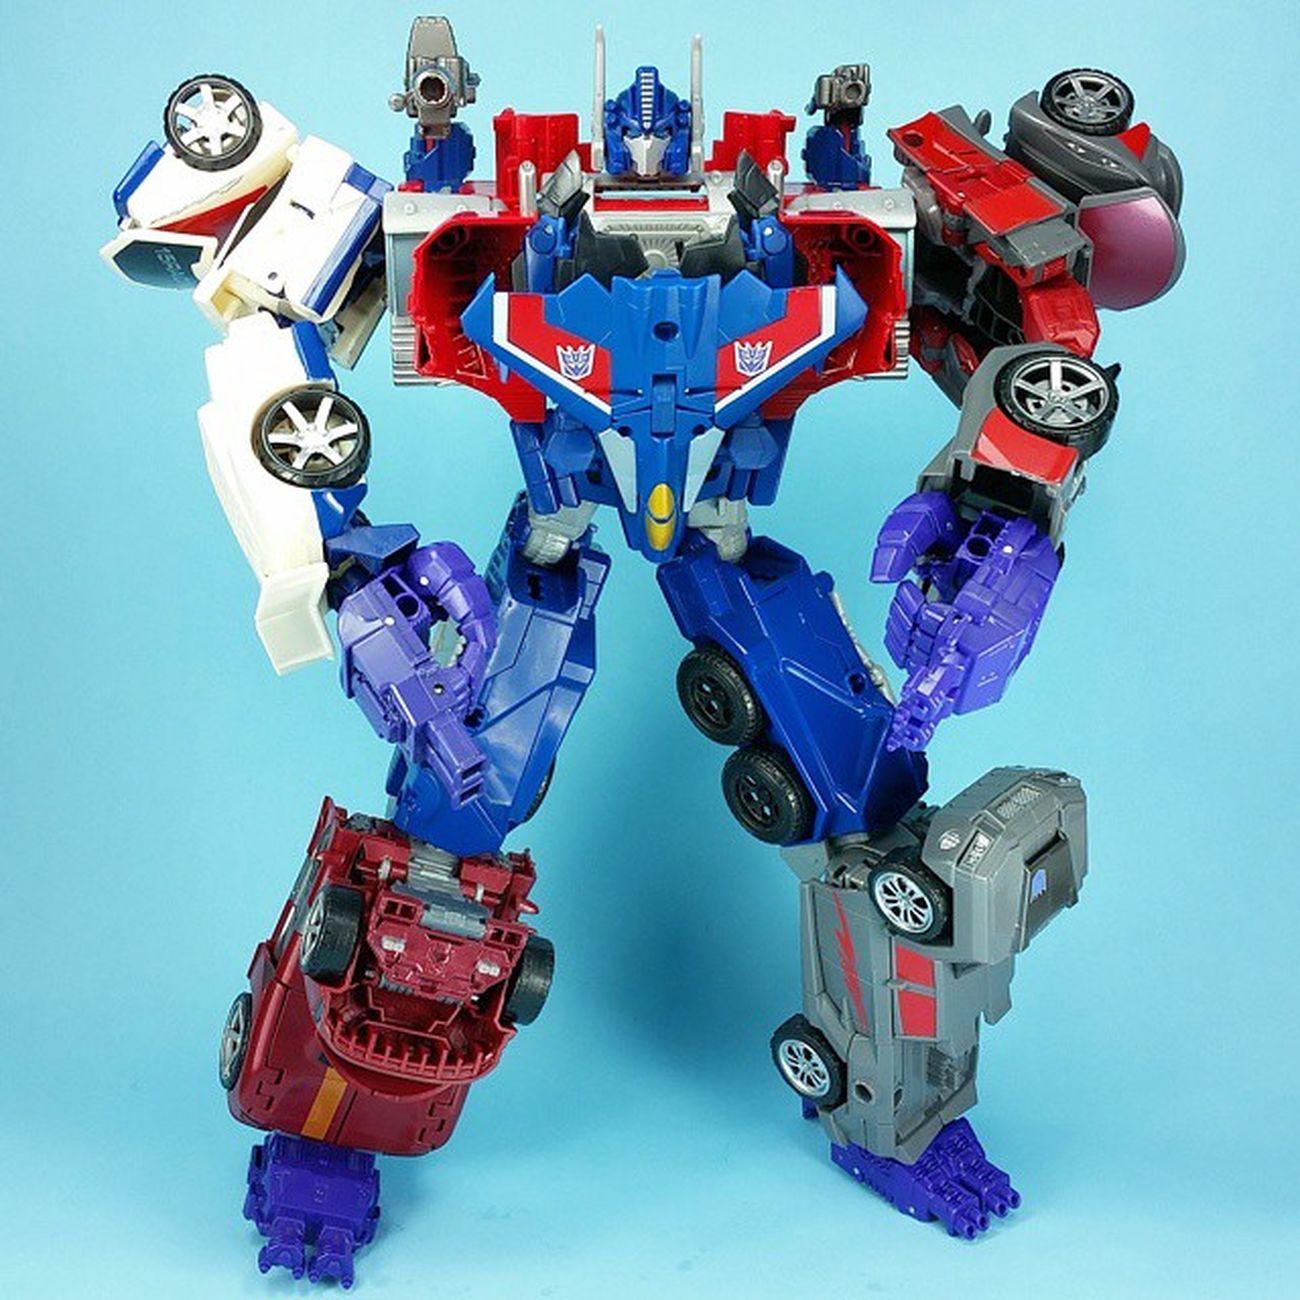 I've had no time to take new pics so here's an alternate angle of Optimusprime + Menasor